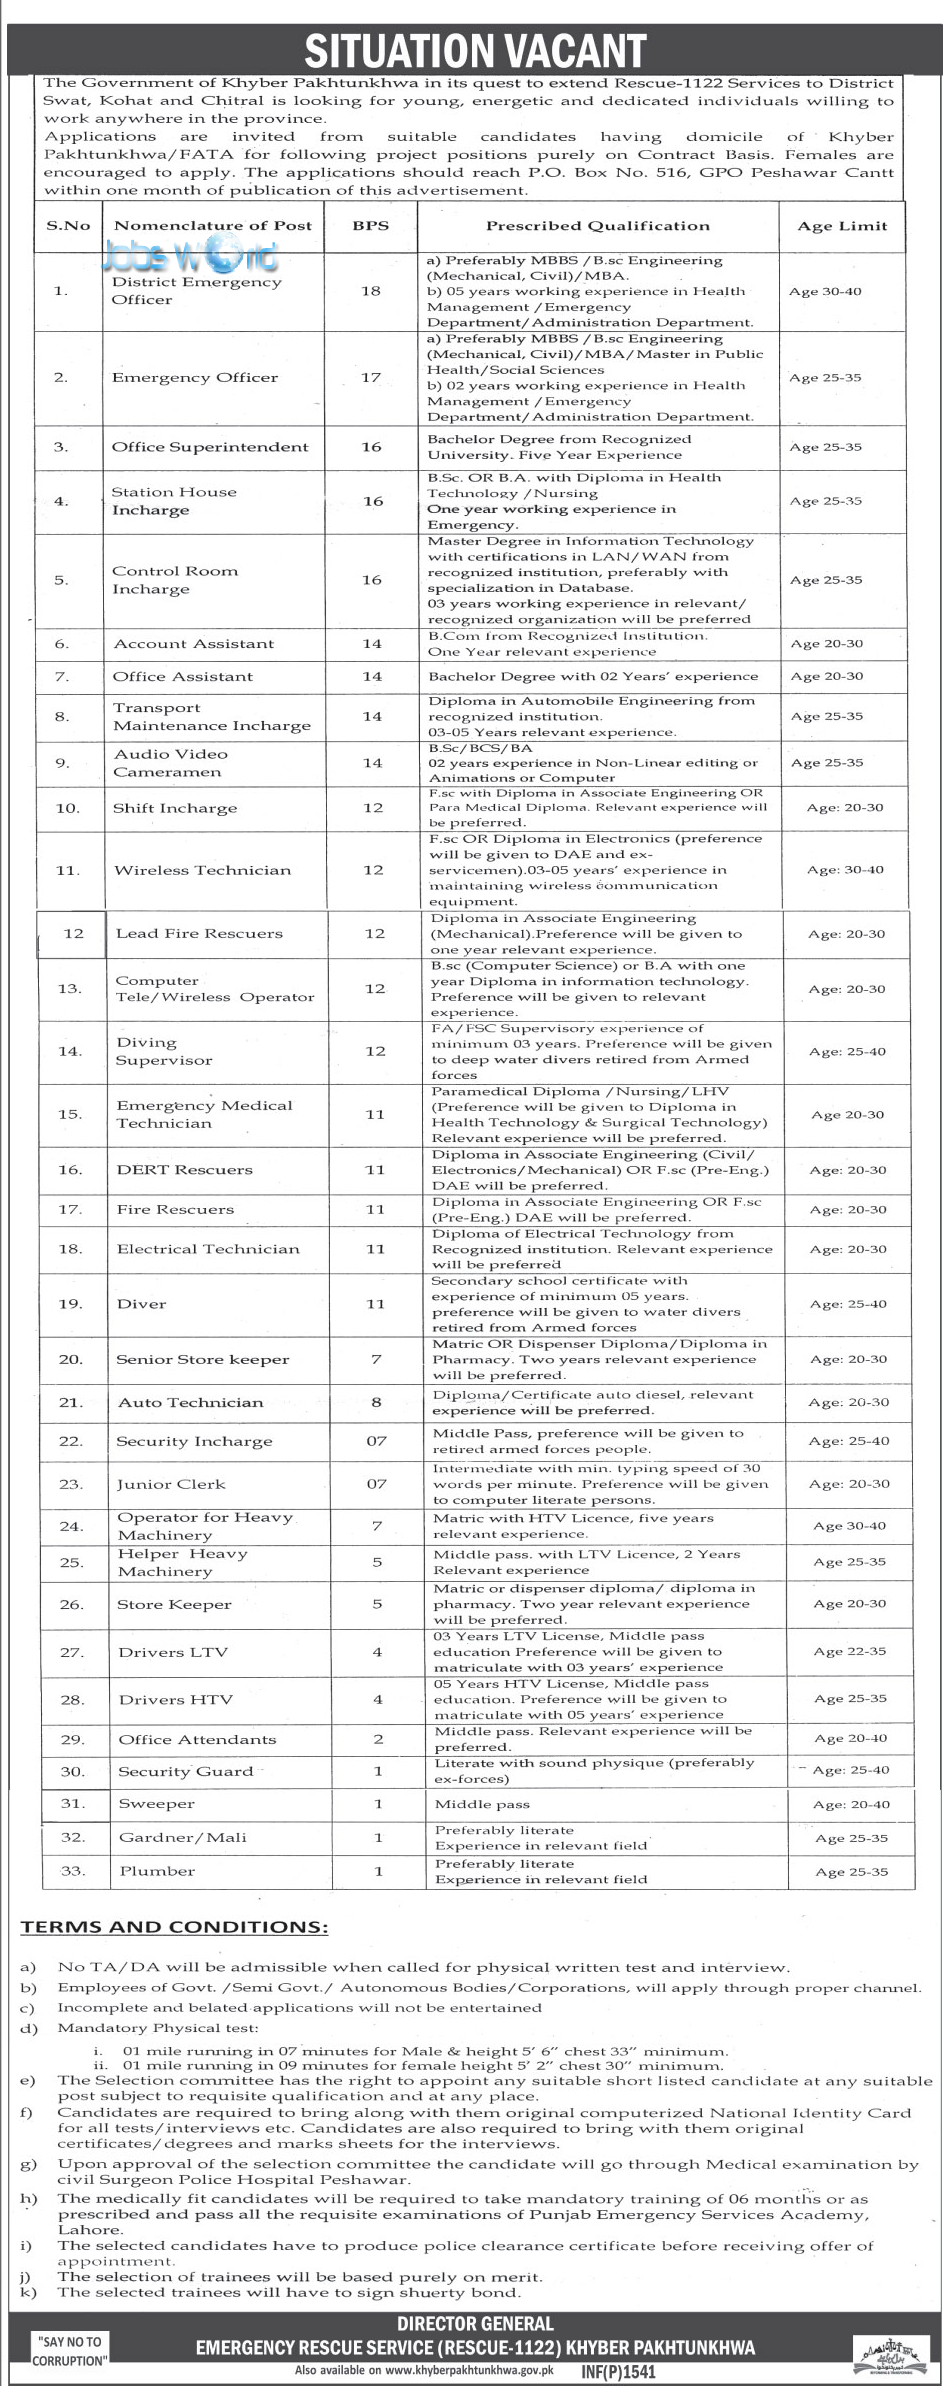 kpk rescue 1122 jobs 2016 application form advertisement jobsworld